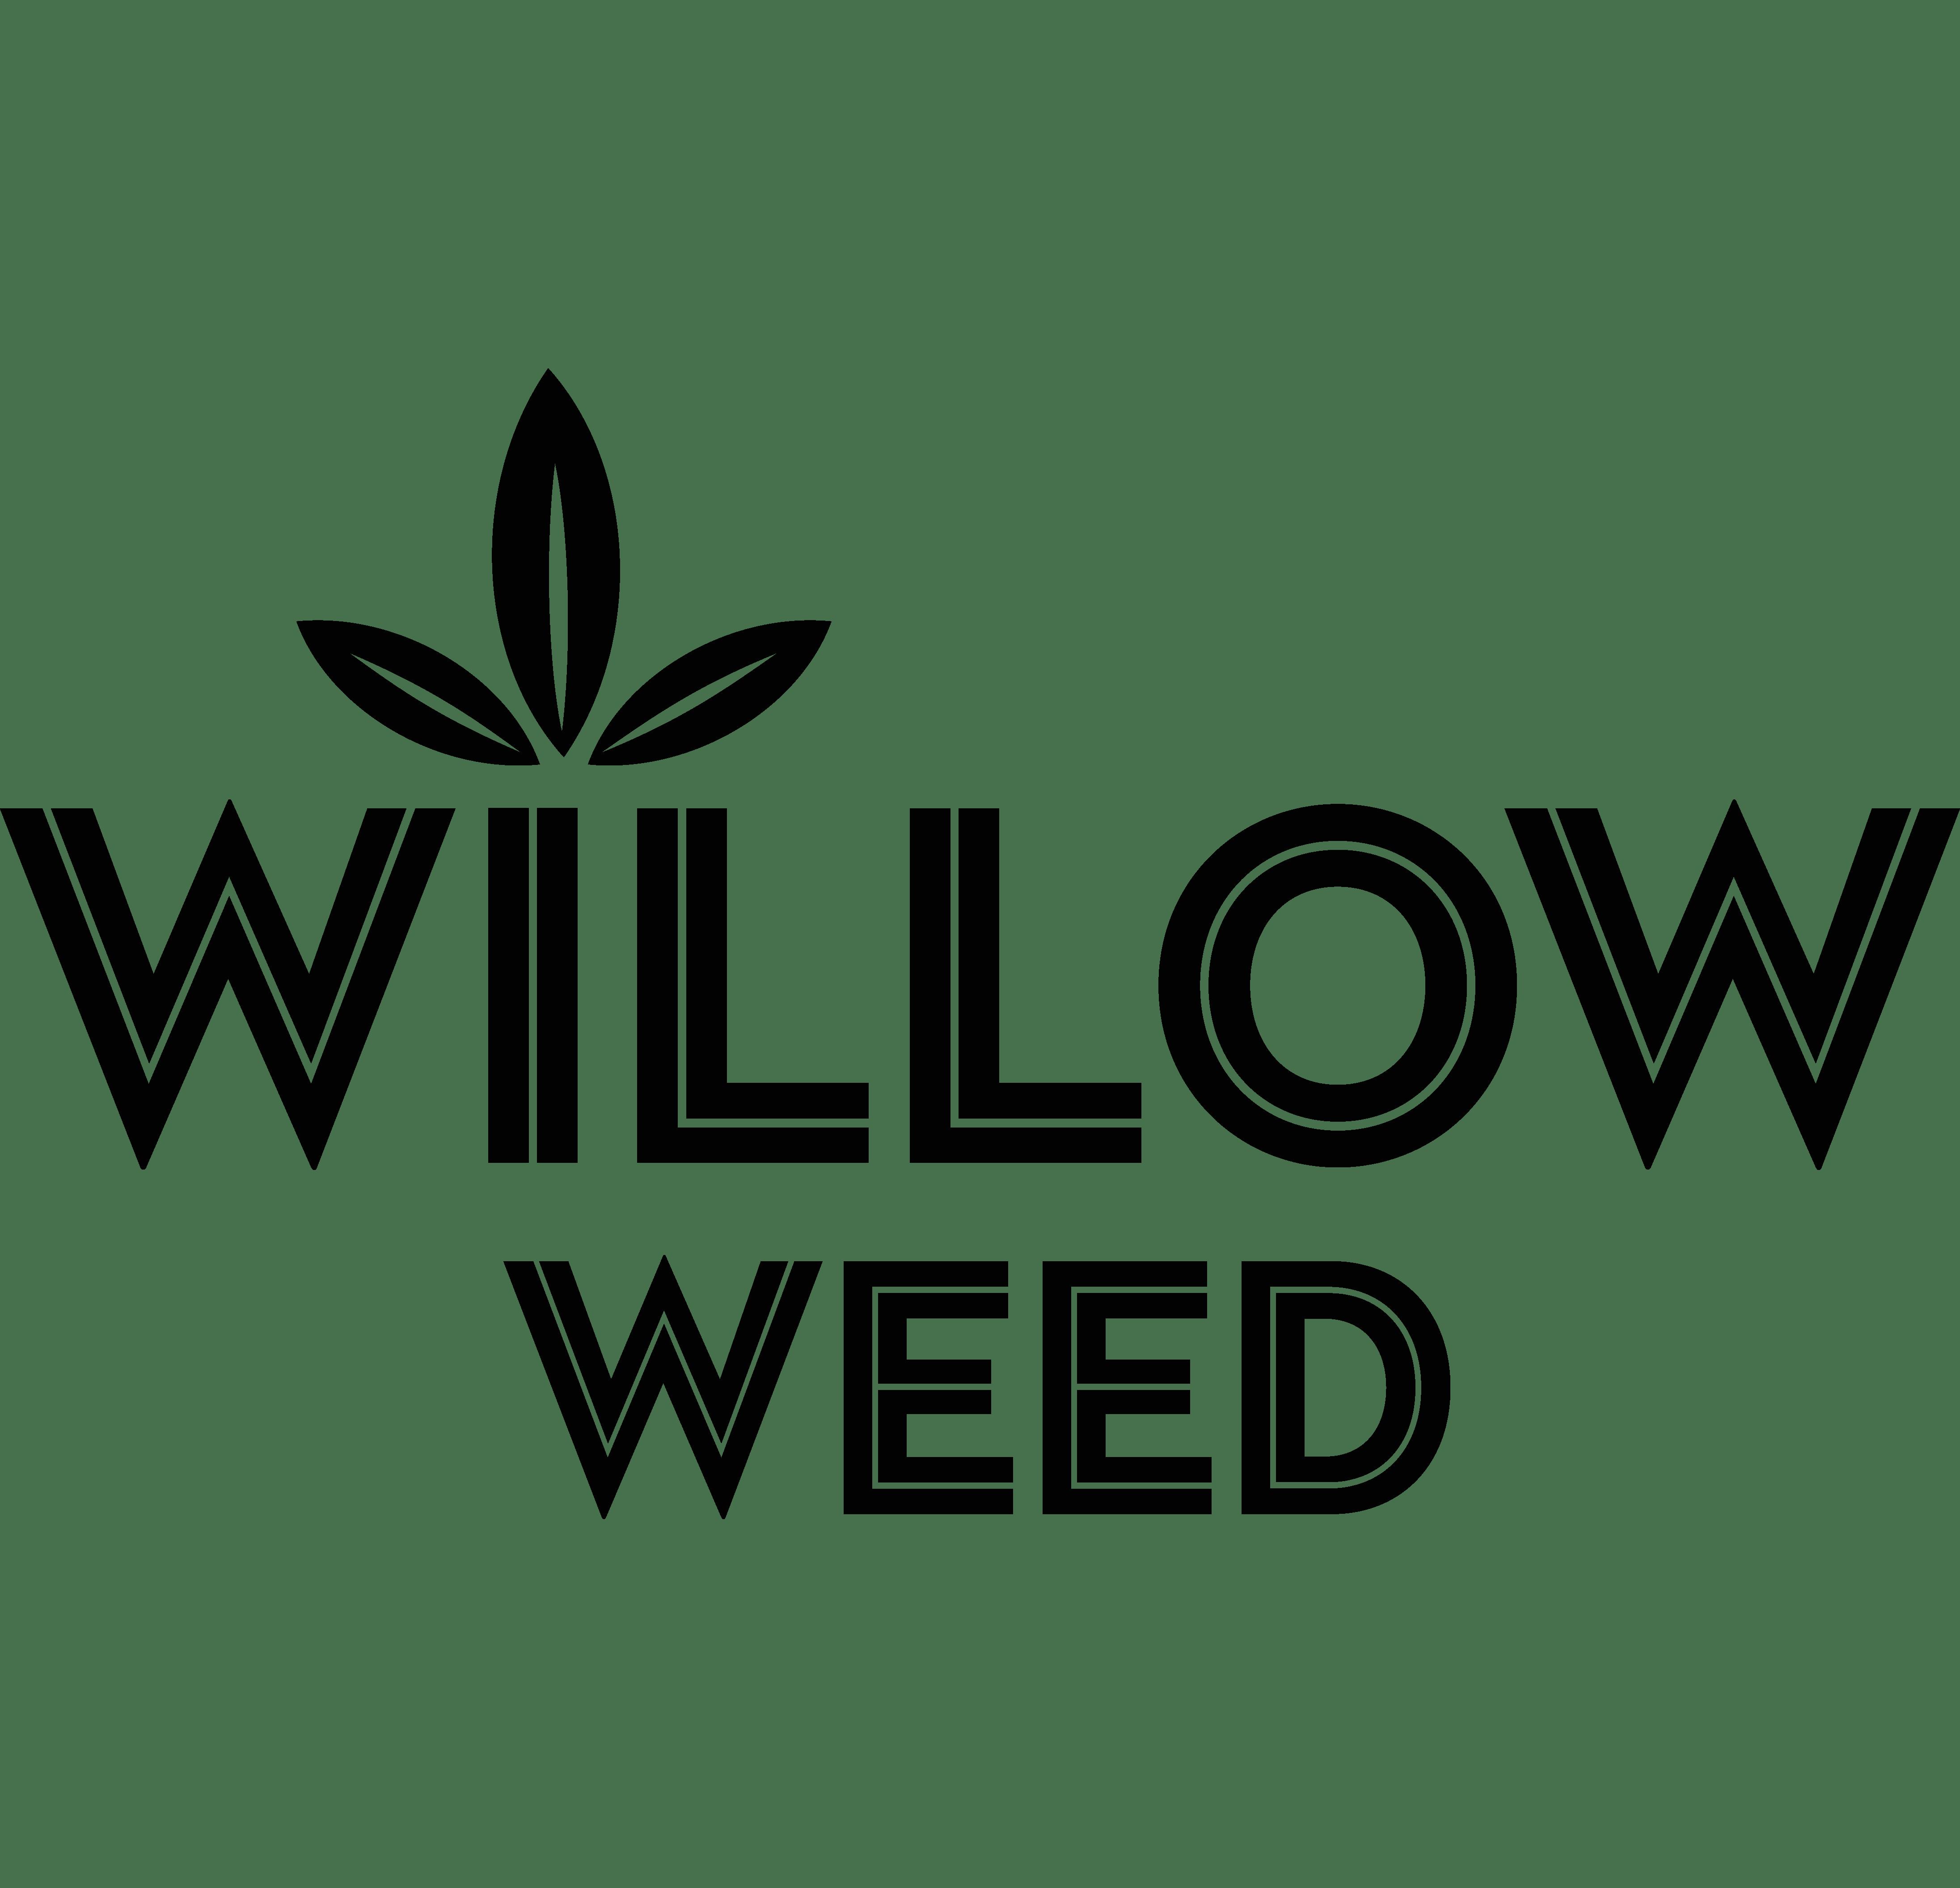 logo-willow-blk